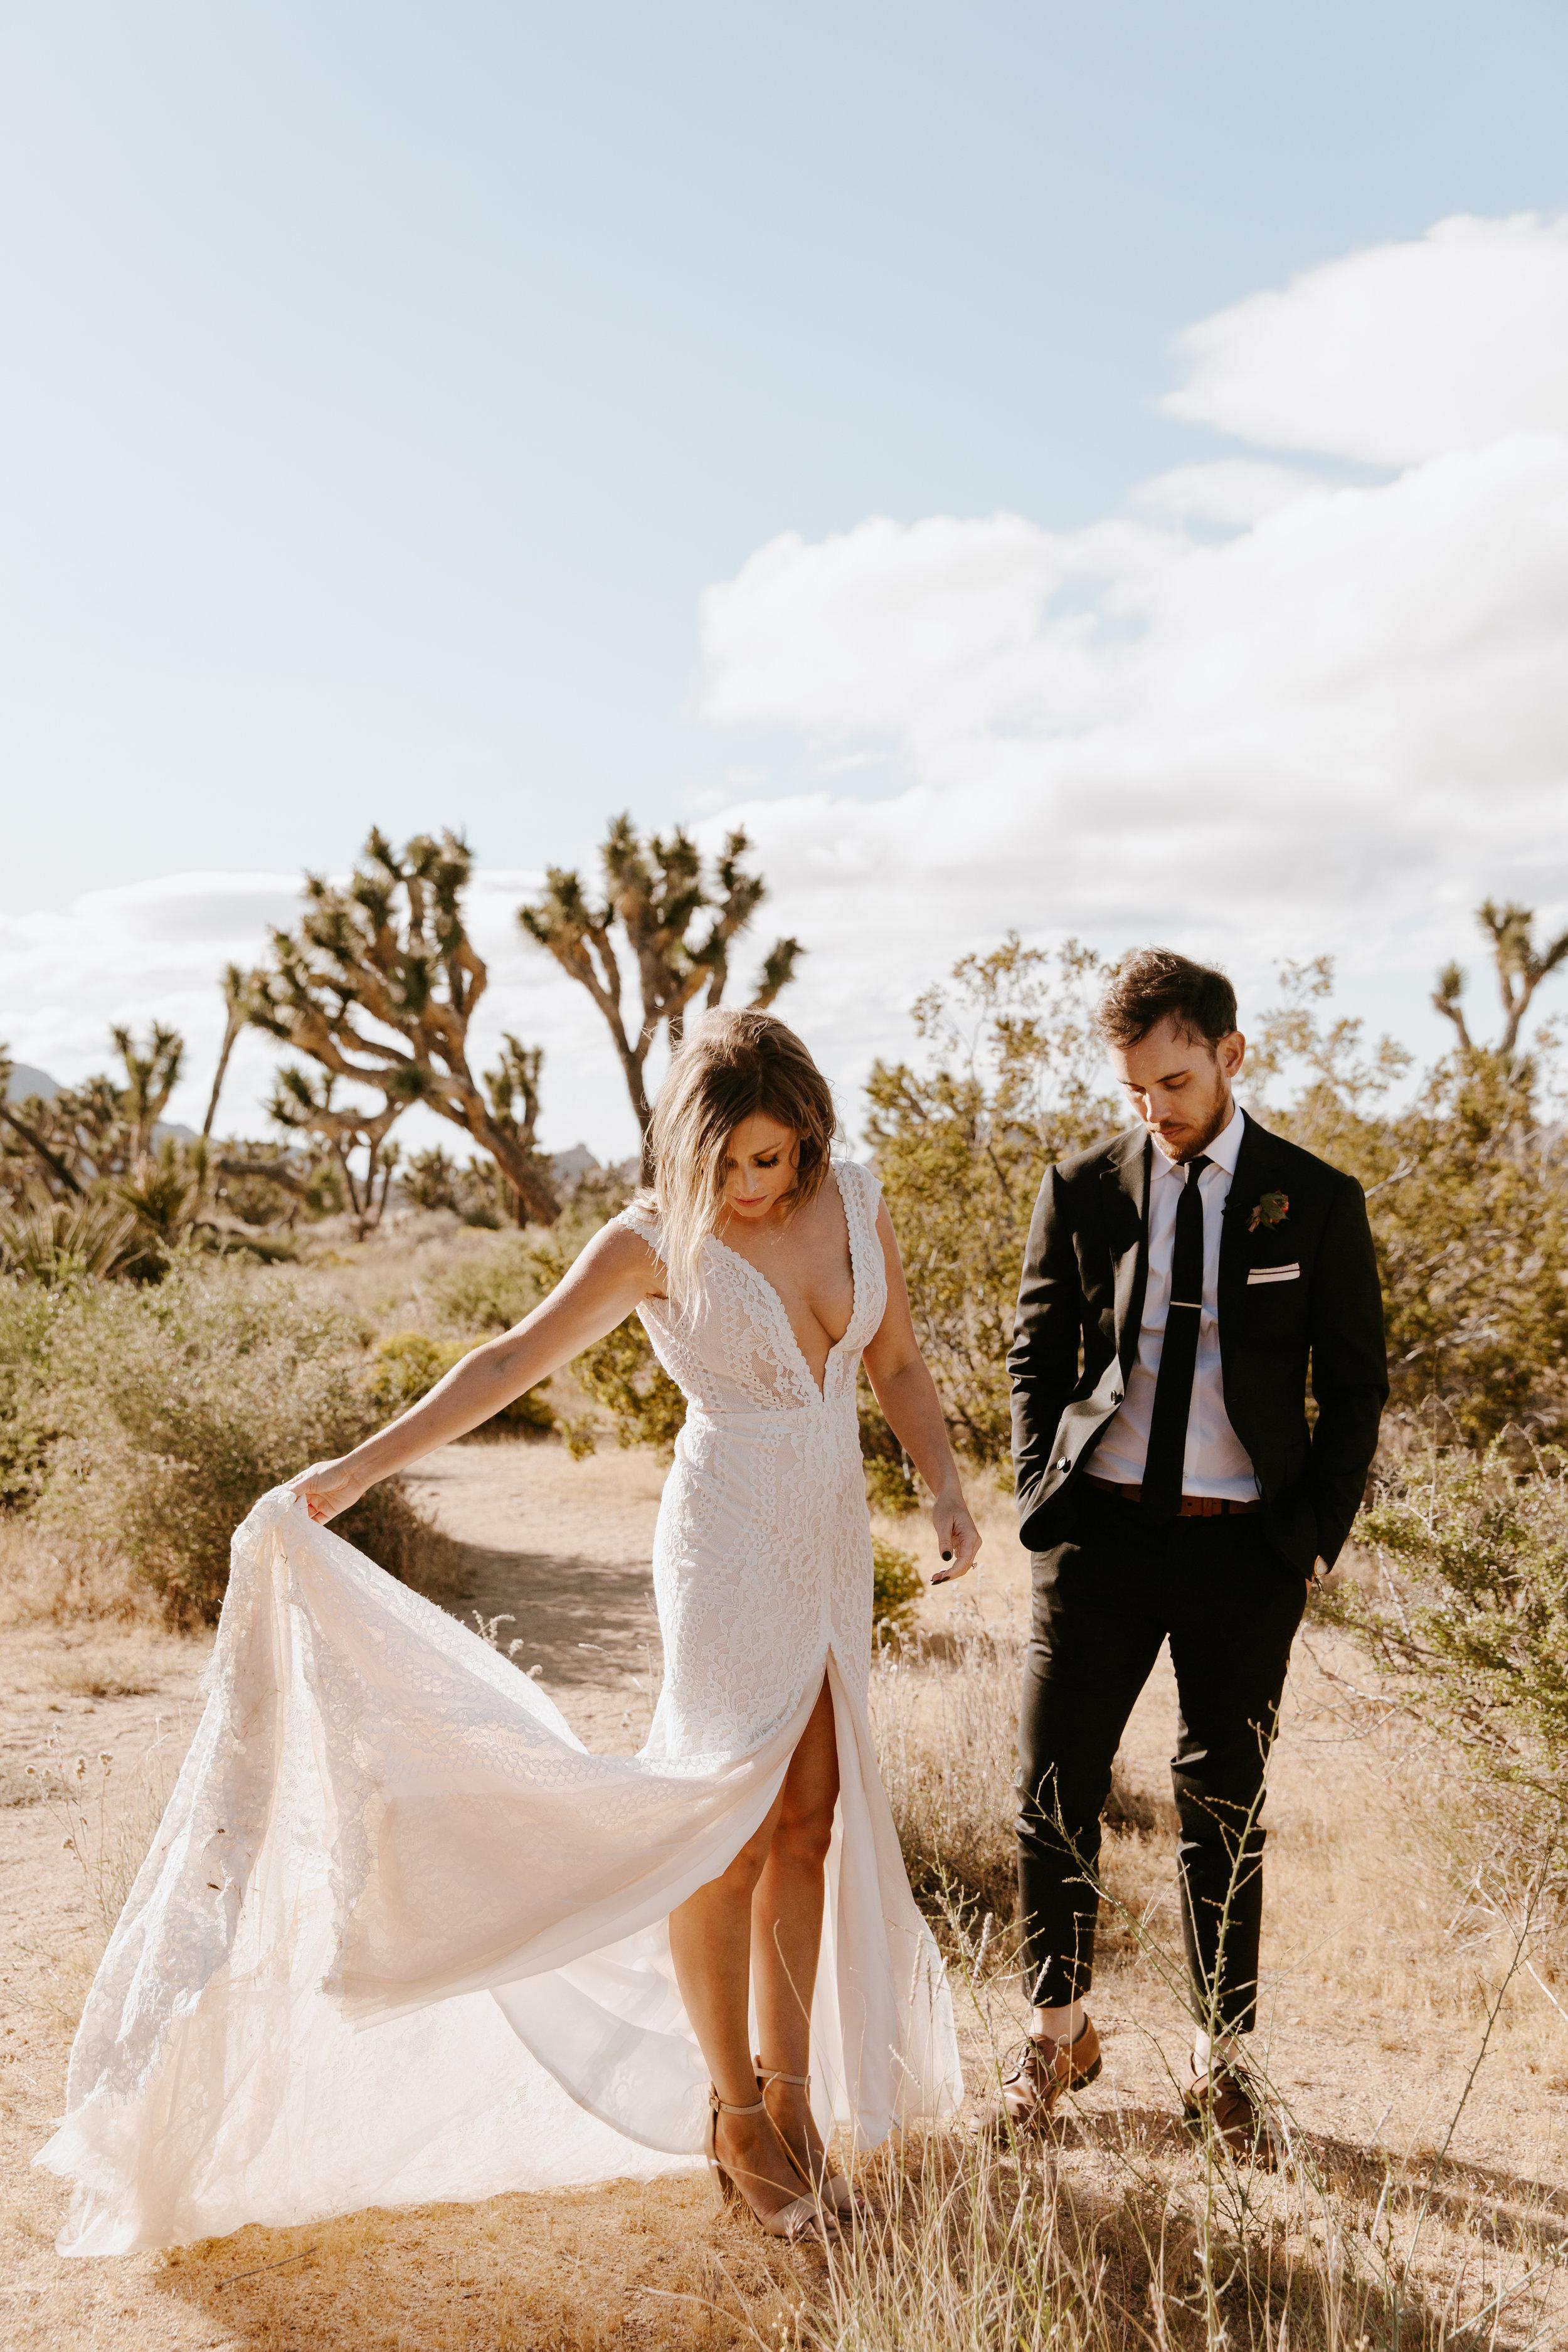 2019-05-26_Callie-Evan_Wedding_Joshua Tree_Paige Nelson_PREVIEWS HR-41.jpg